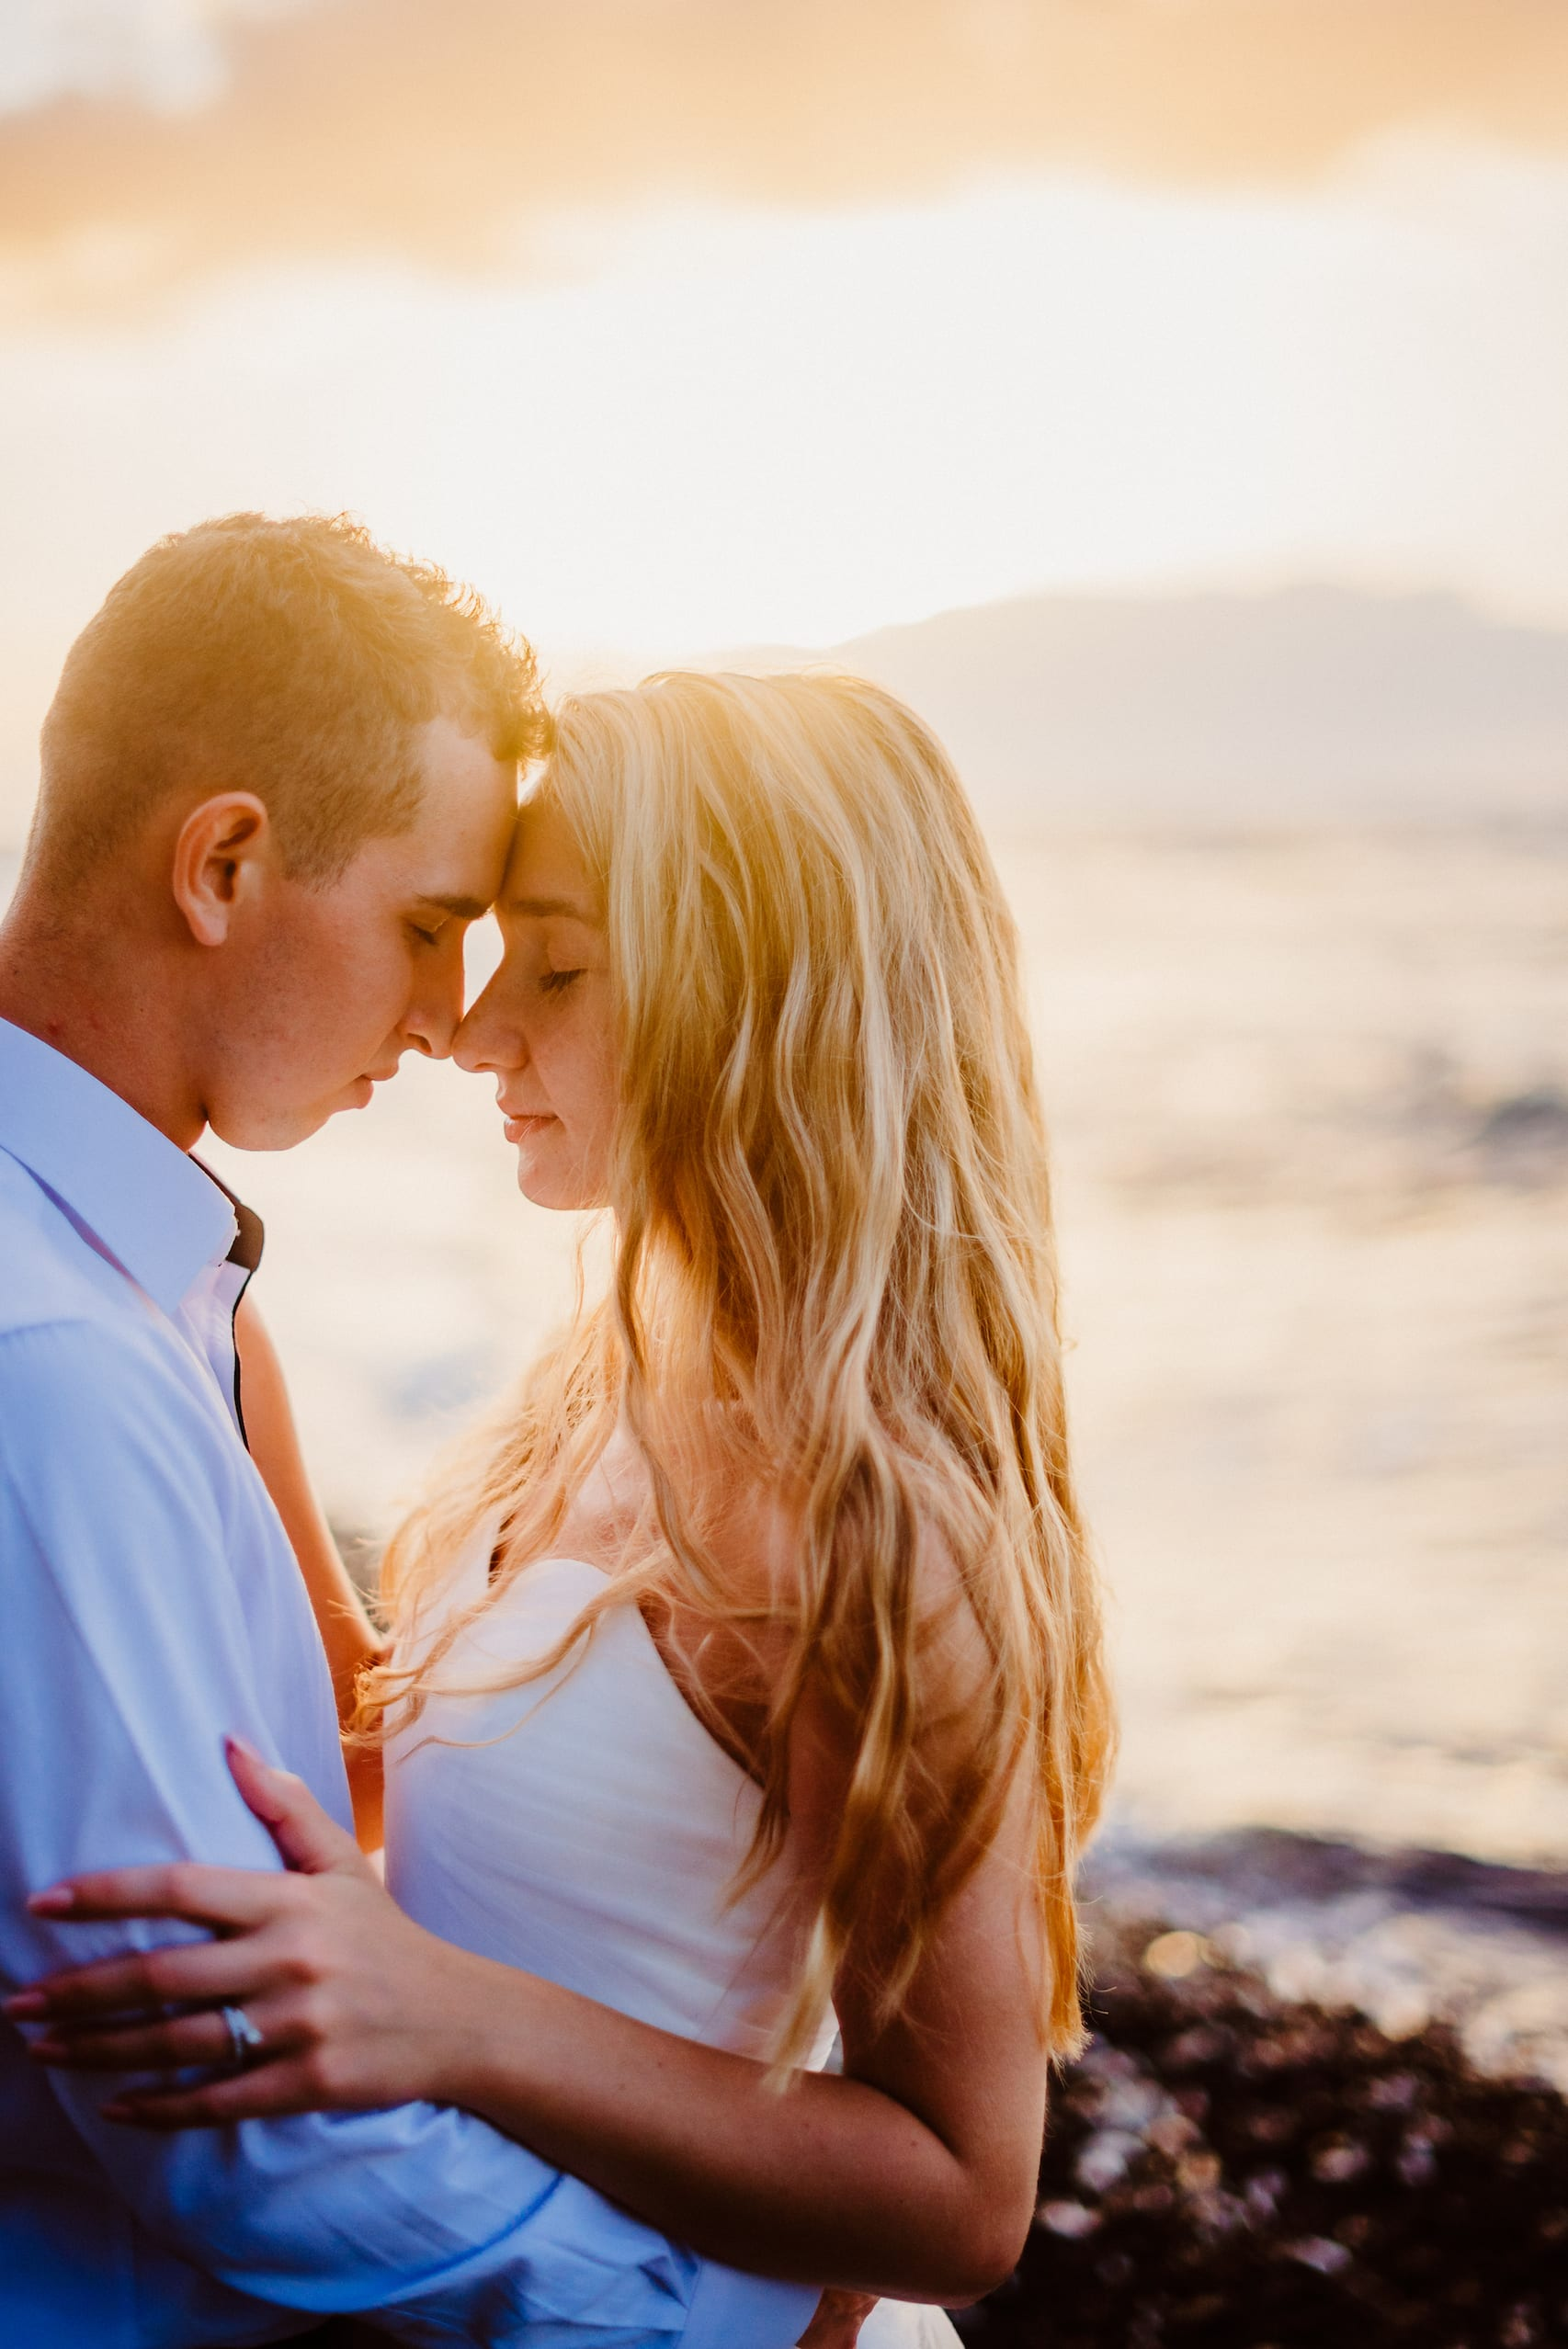 Big-Island-Elopement-Private-Wedding-Hawaii-Beach-11.jpg